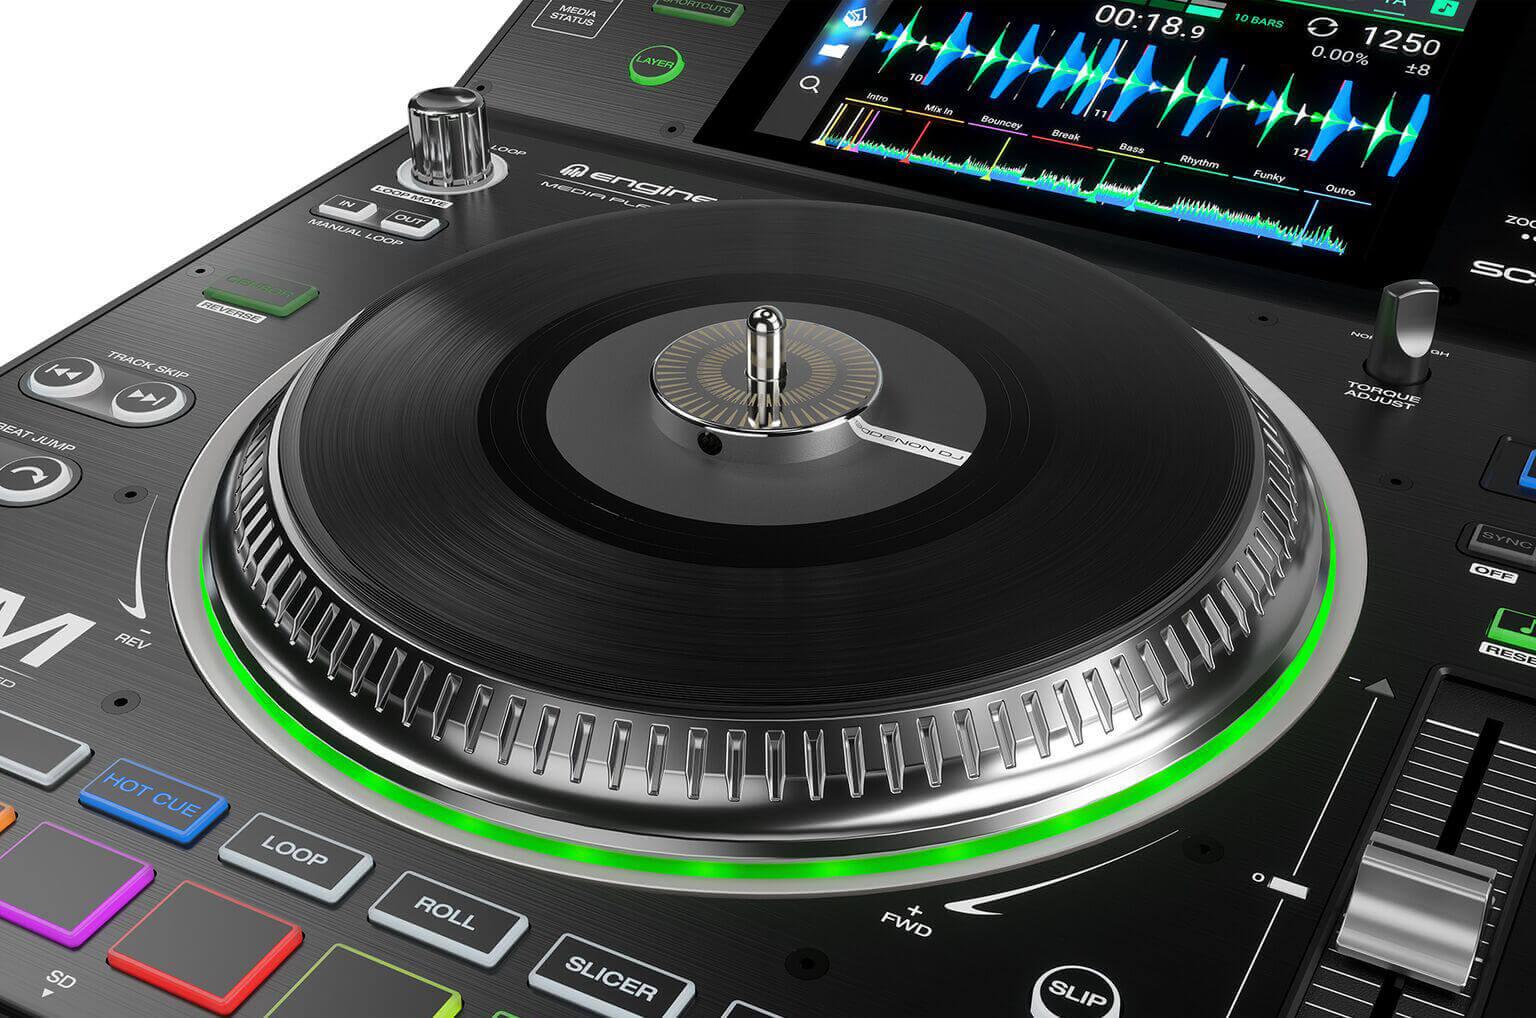 Denon DJ SC5000M platter